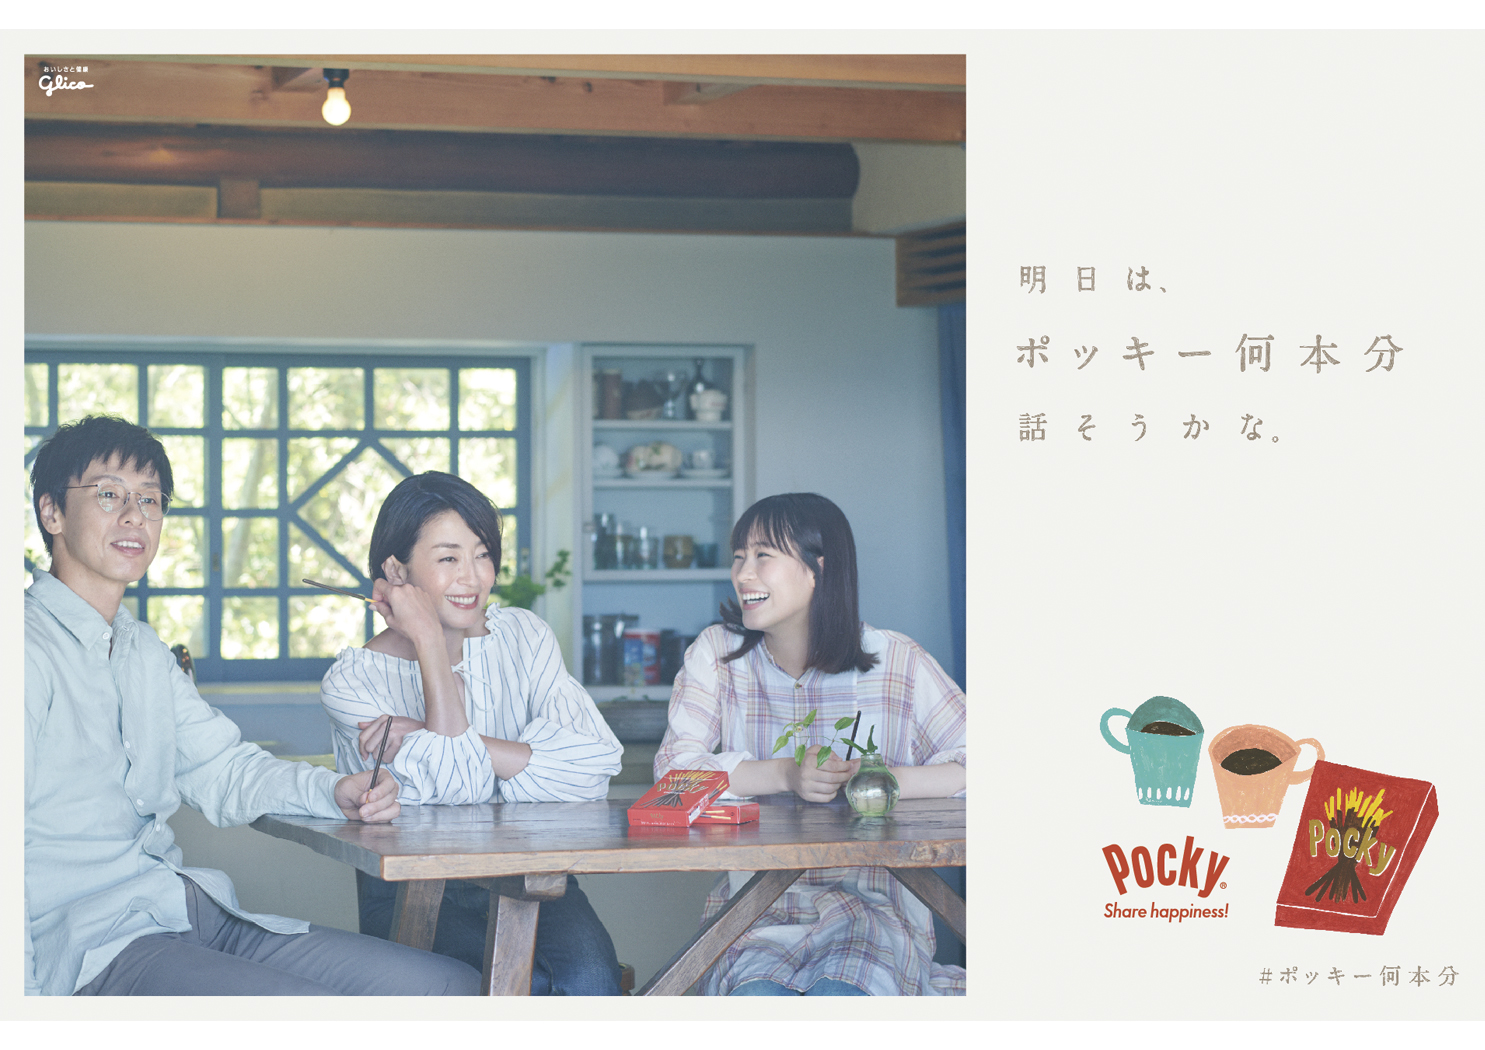 glico Pocky debut